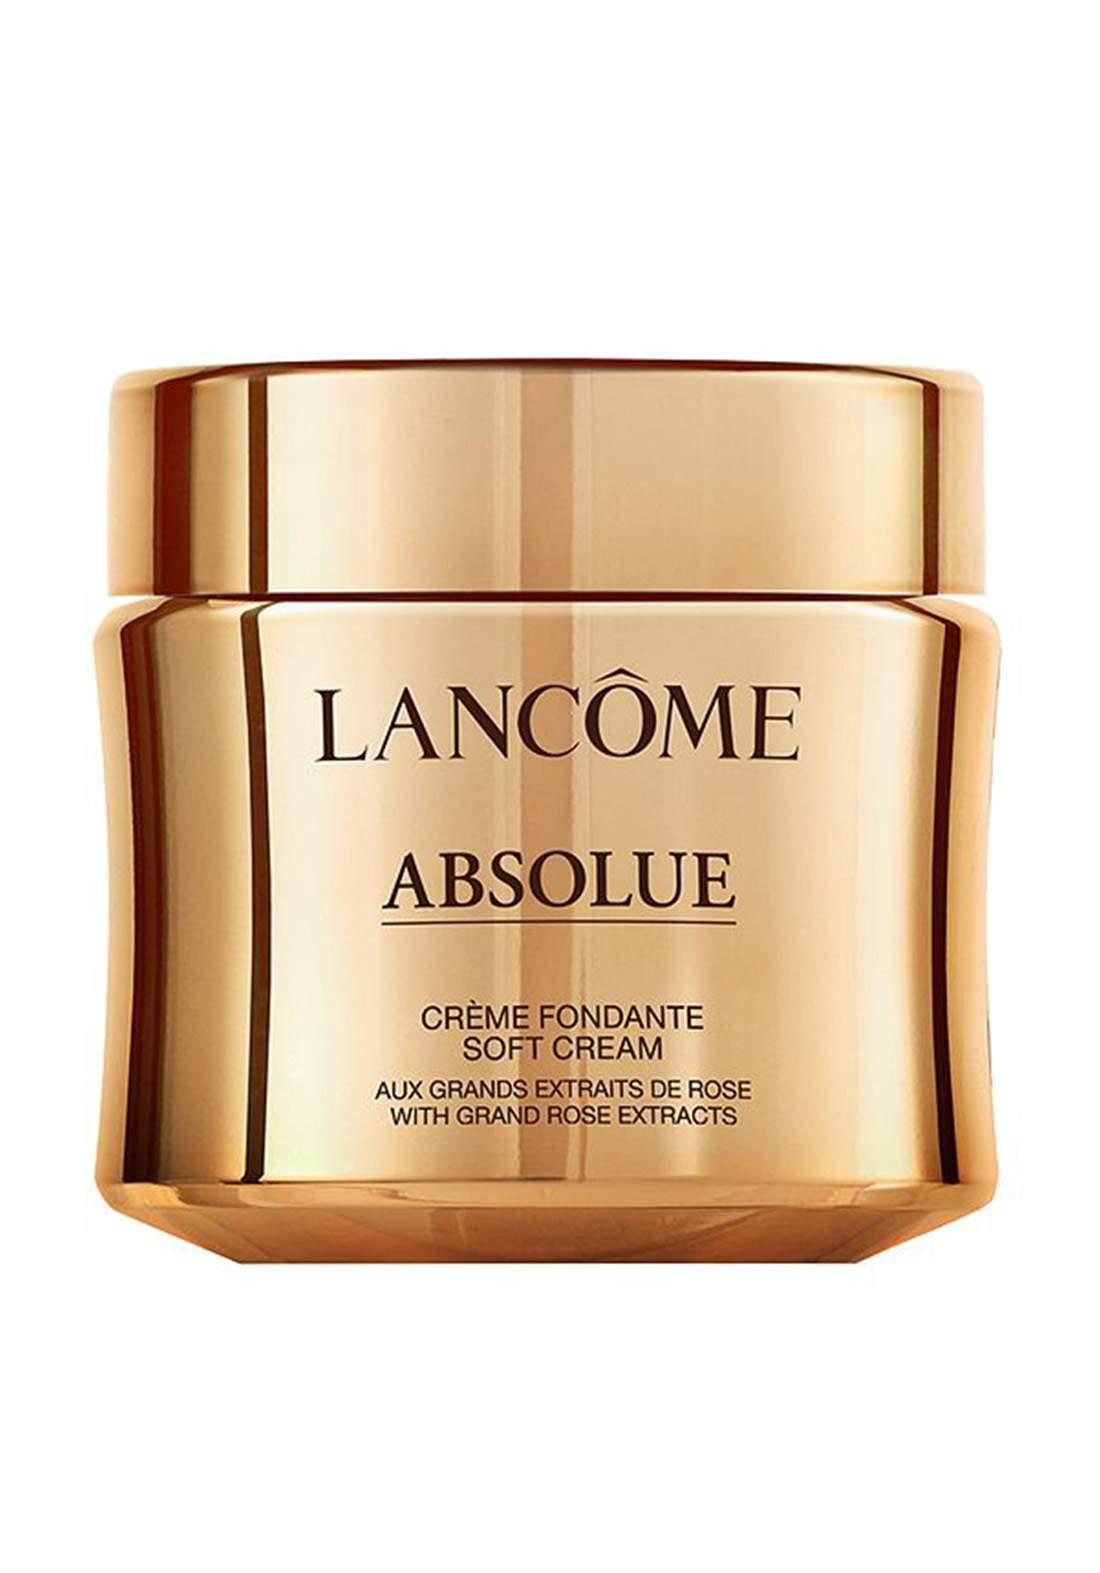 Lancome Absolue Creme Fondante Soft Cream 15ml  كريم للبشرة